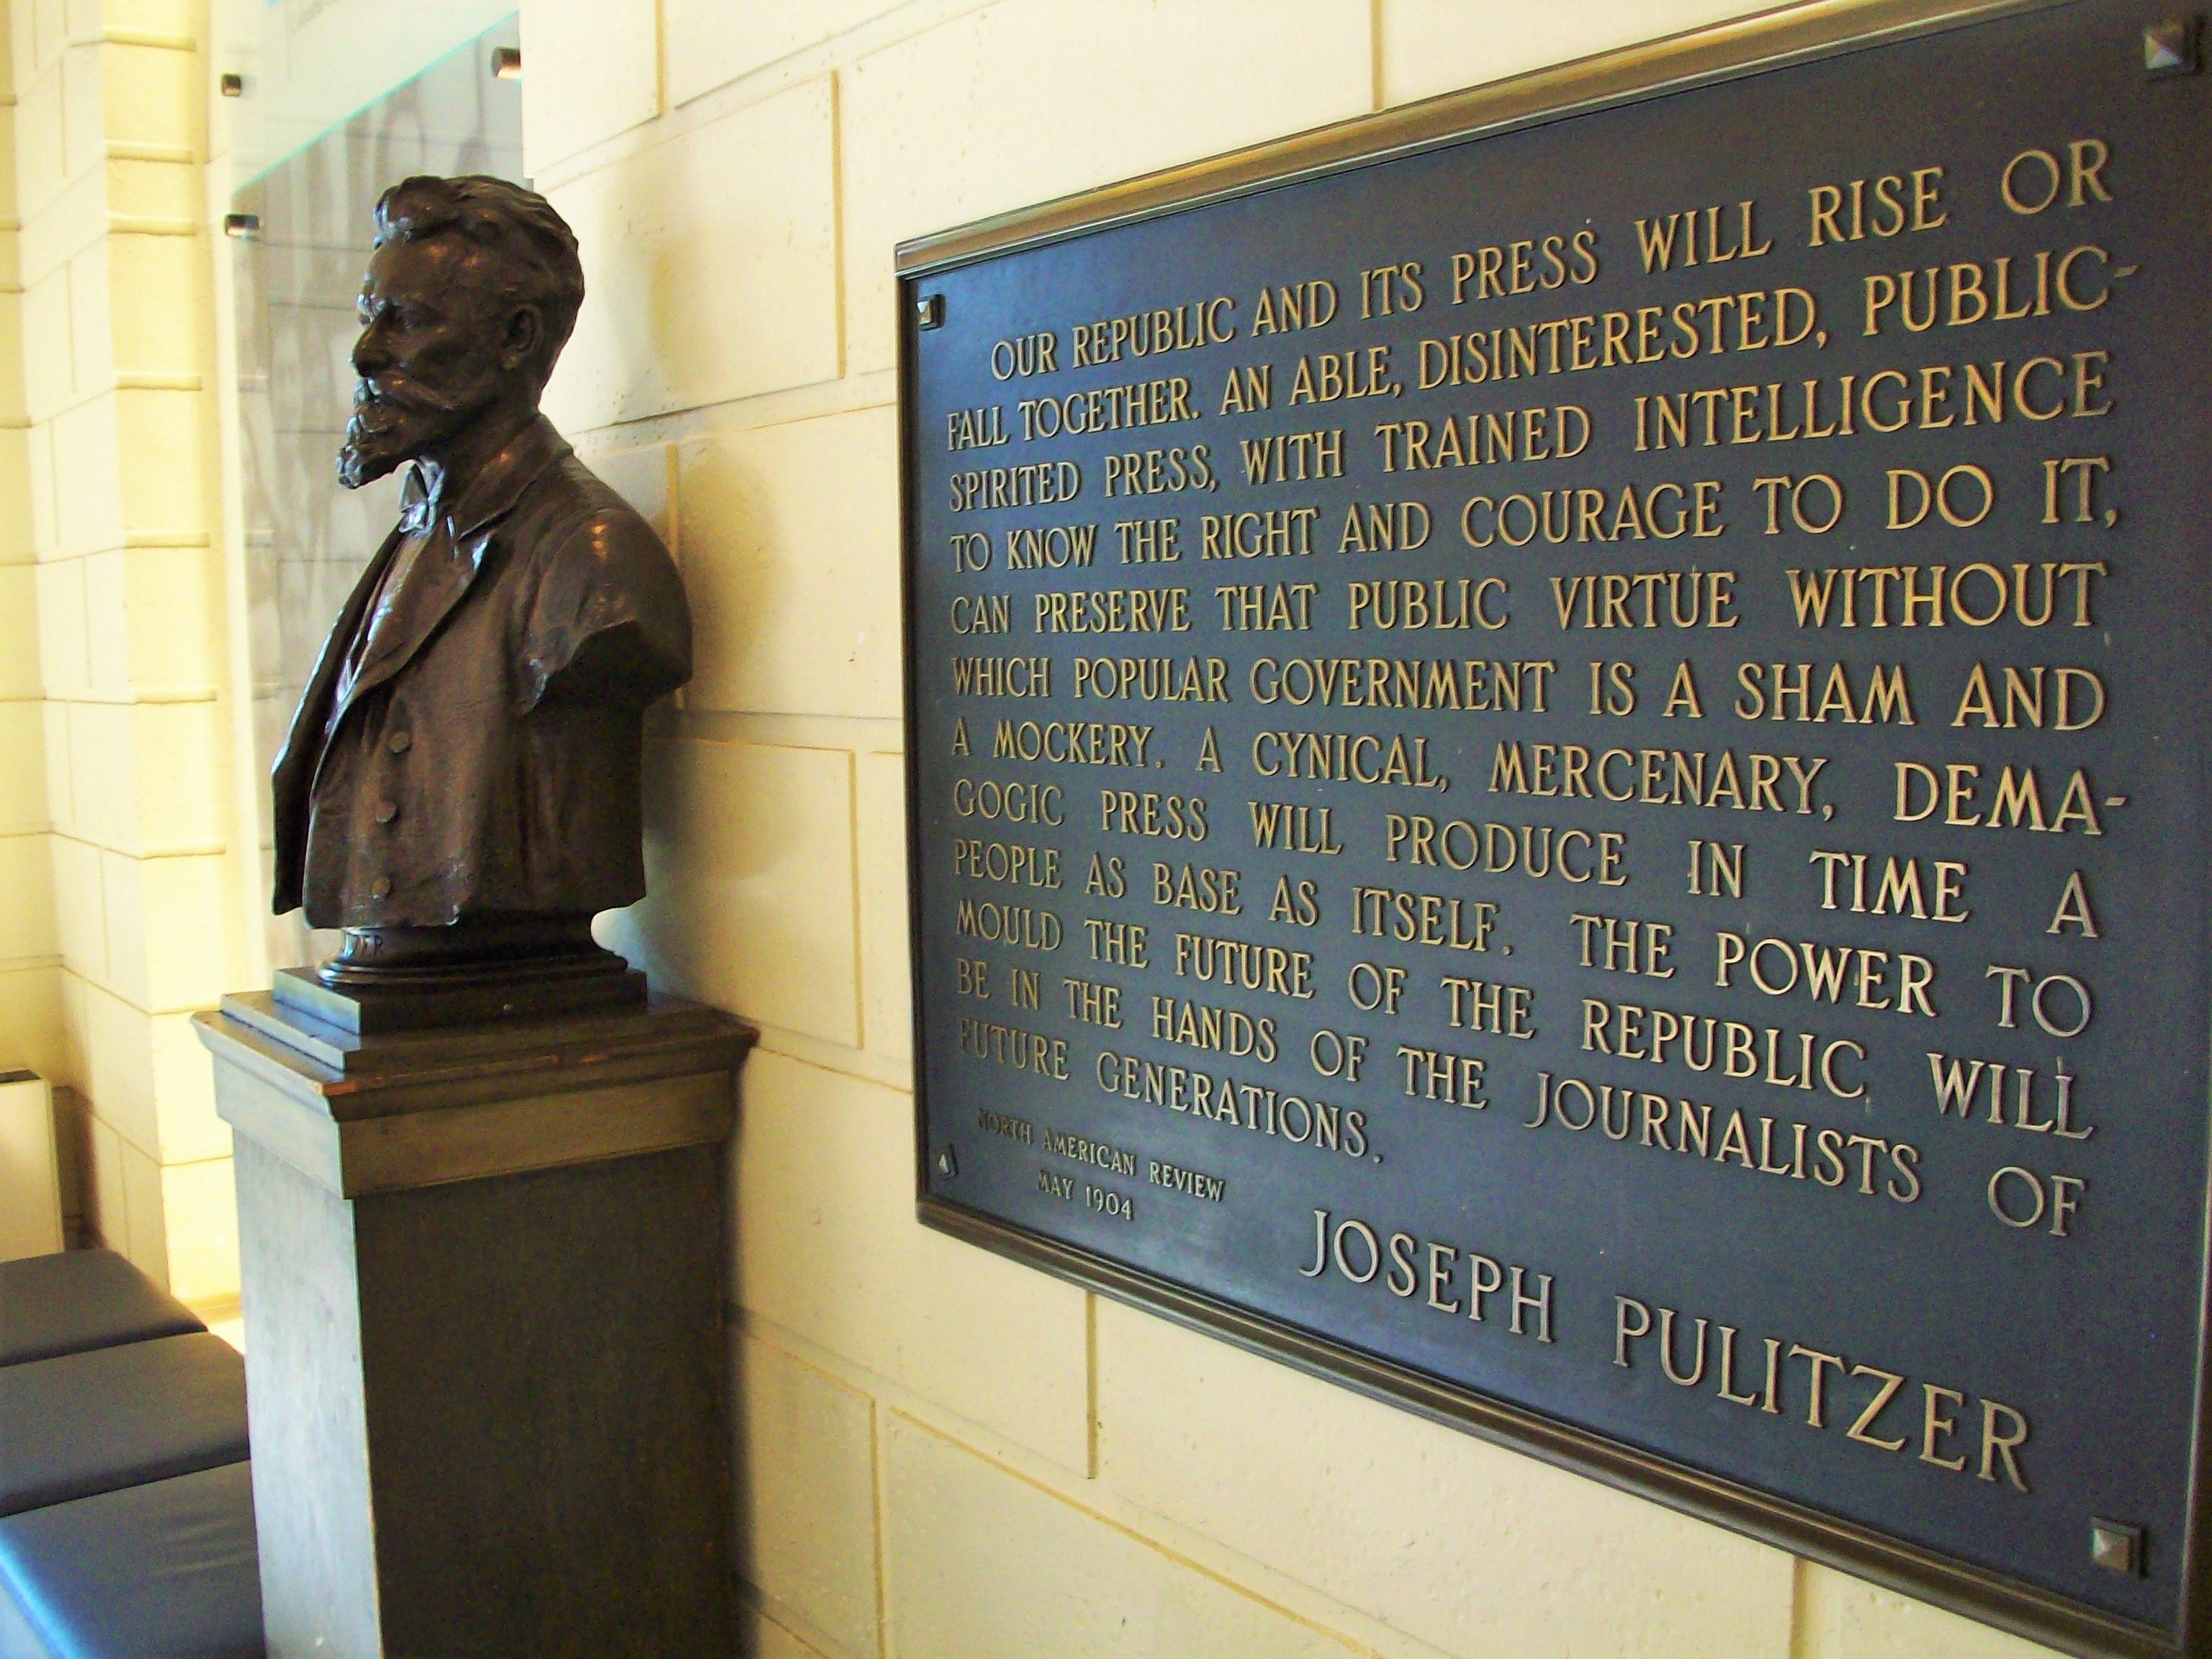 Statement of Purpose to the Columbia University Graduate School of Journalism